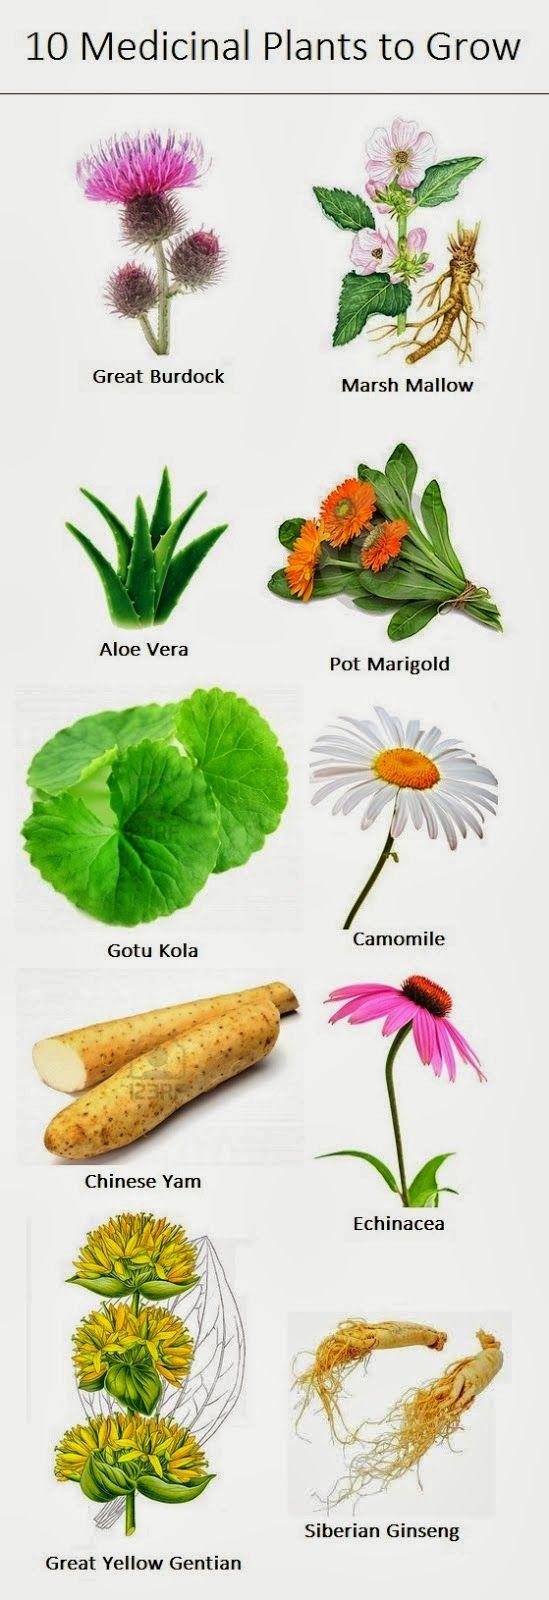 Medicinal Plants to Grow